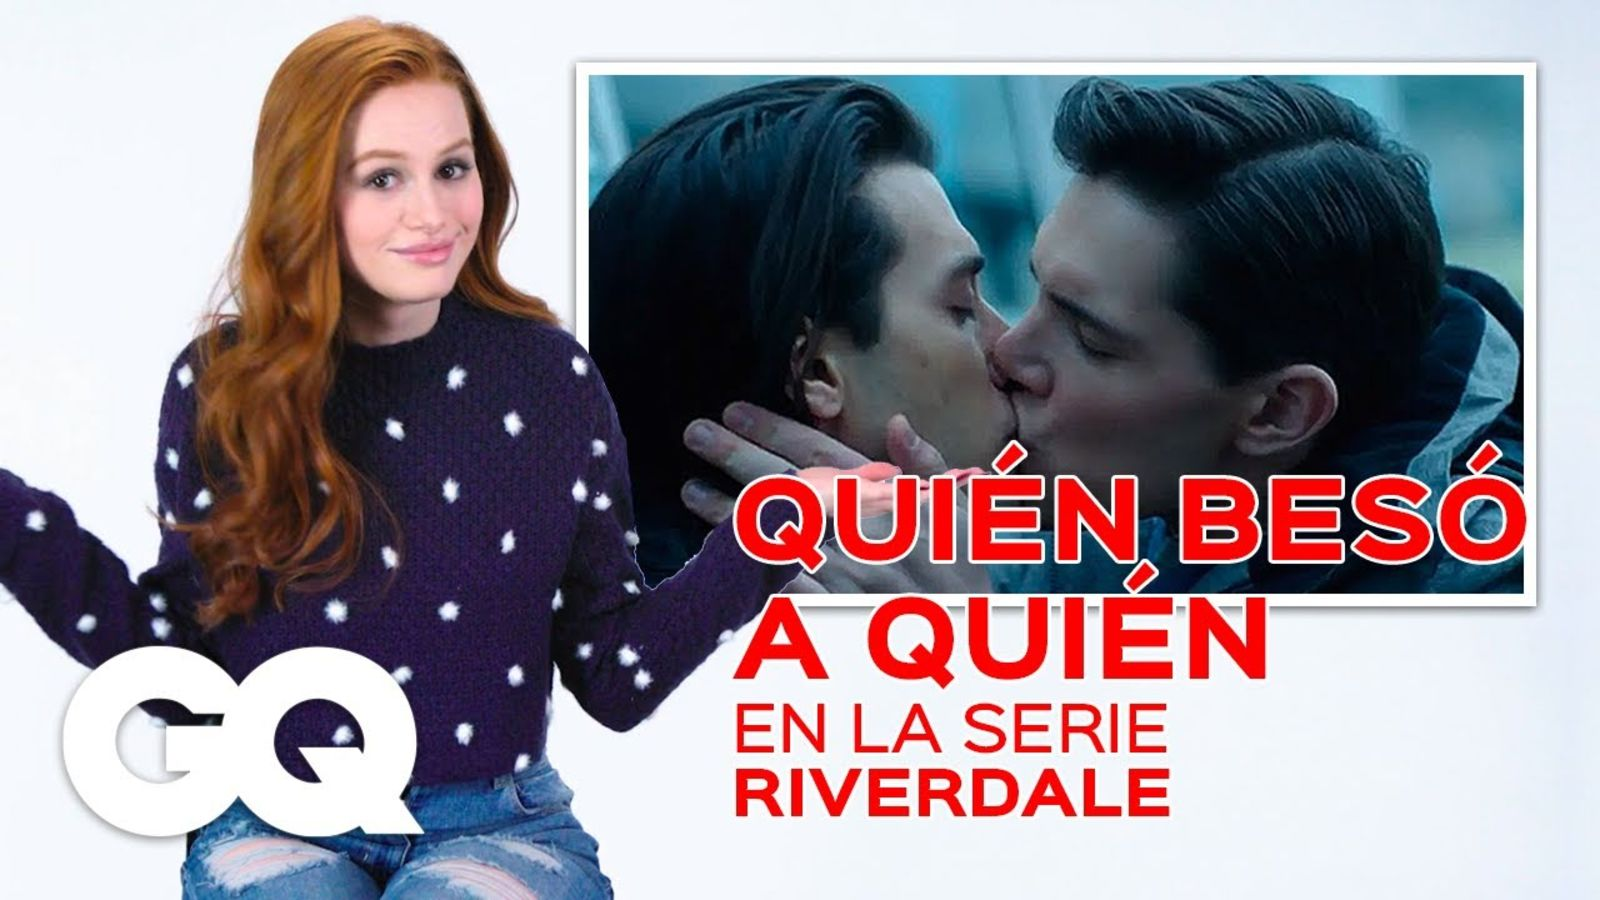 Madelaine Petsch adivina quién besa a quién en Riverdale | GQ México y Latinoamérica